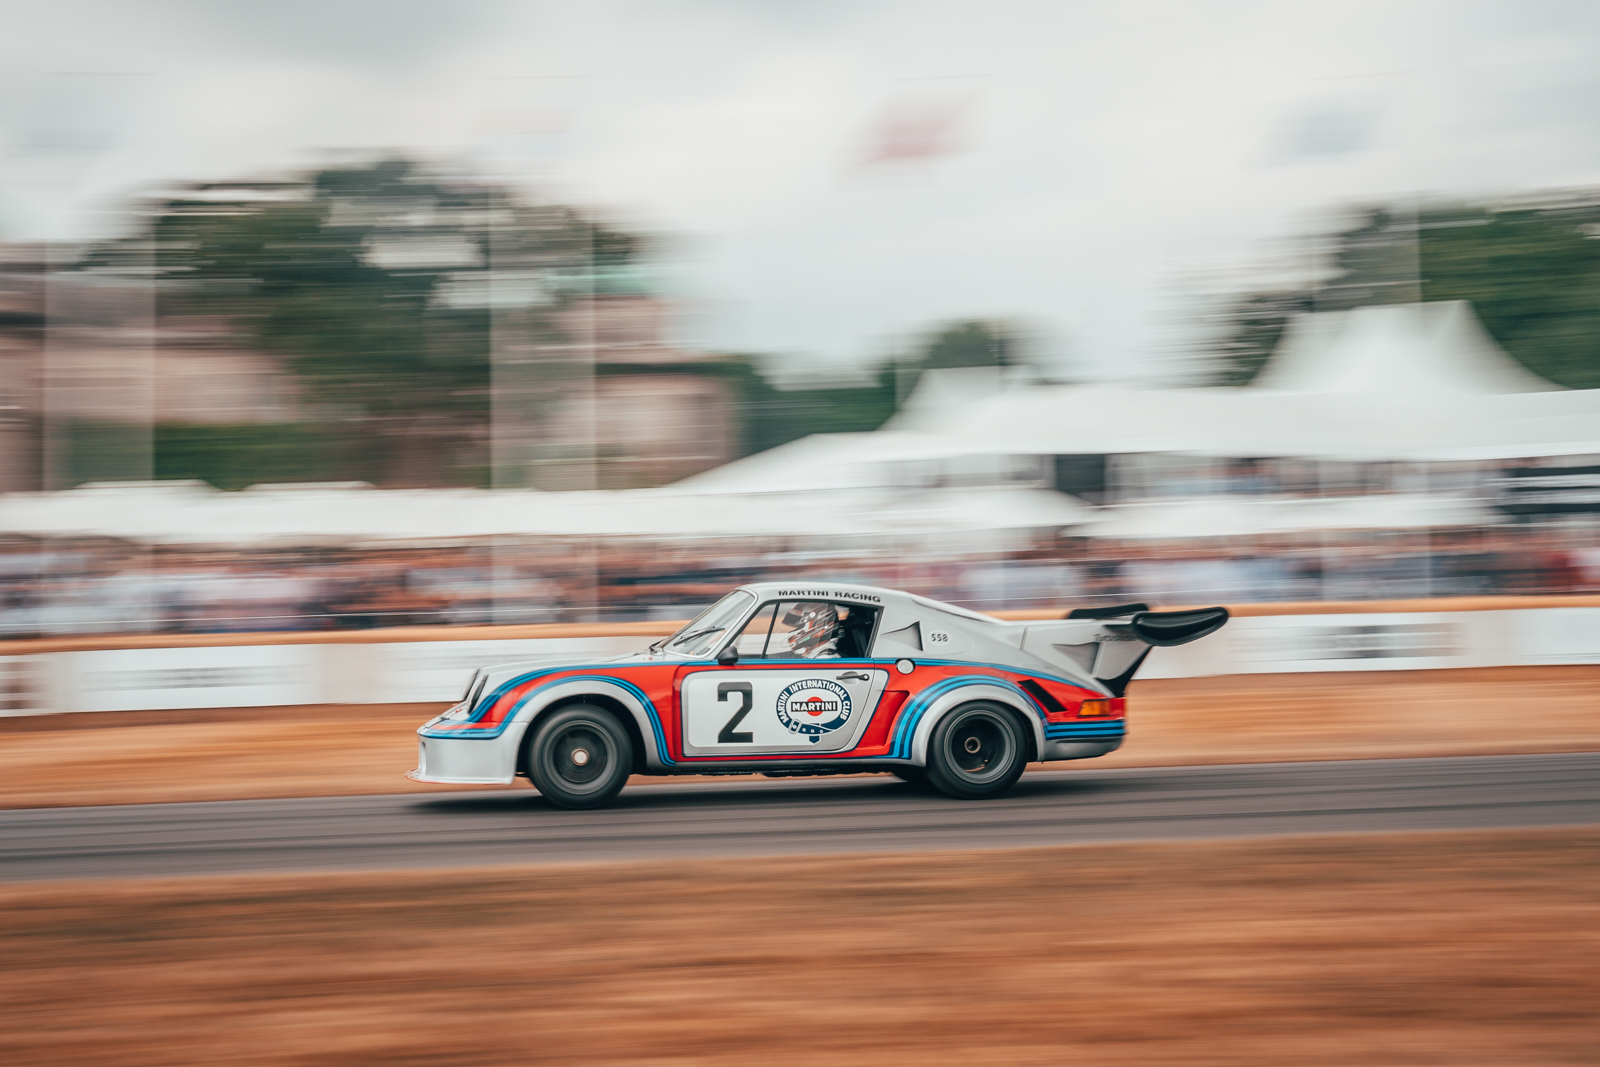 RP - Porsche Goodwood Fesitval of Speed 70 Years 2018-57.jpg